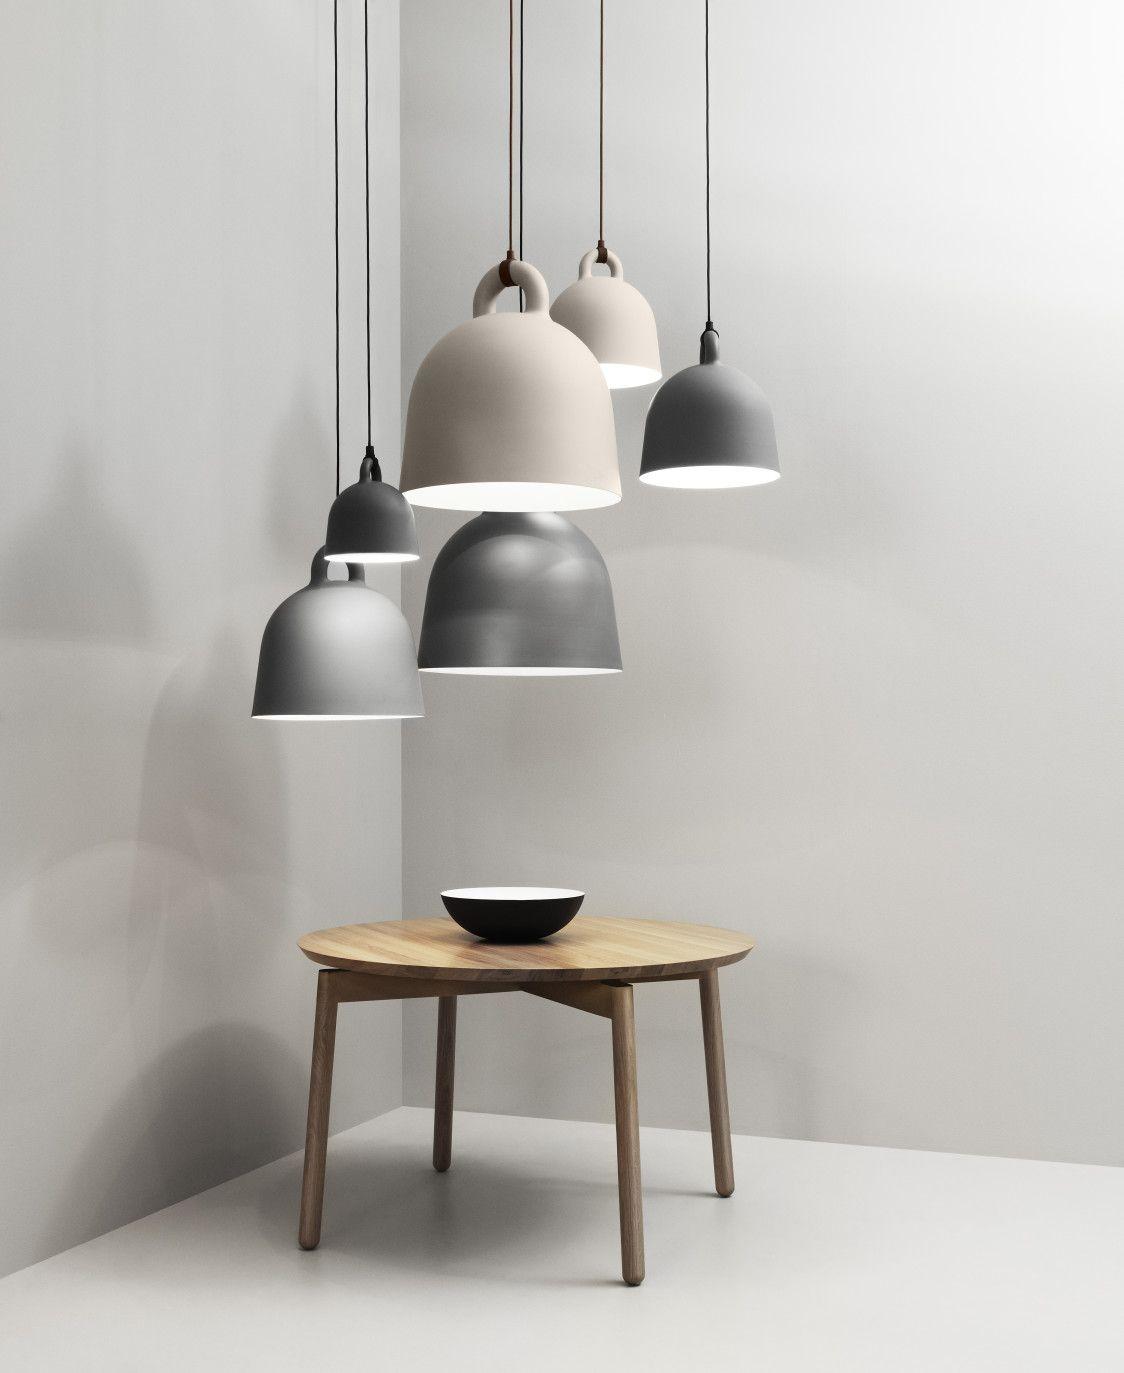 bell lamp x small sand nordkraft huisverlichting slaapkamer verlichting slaapkamer kroonluchters